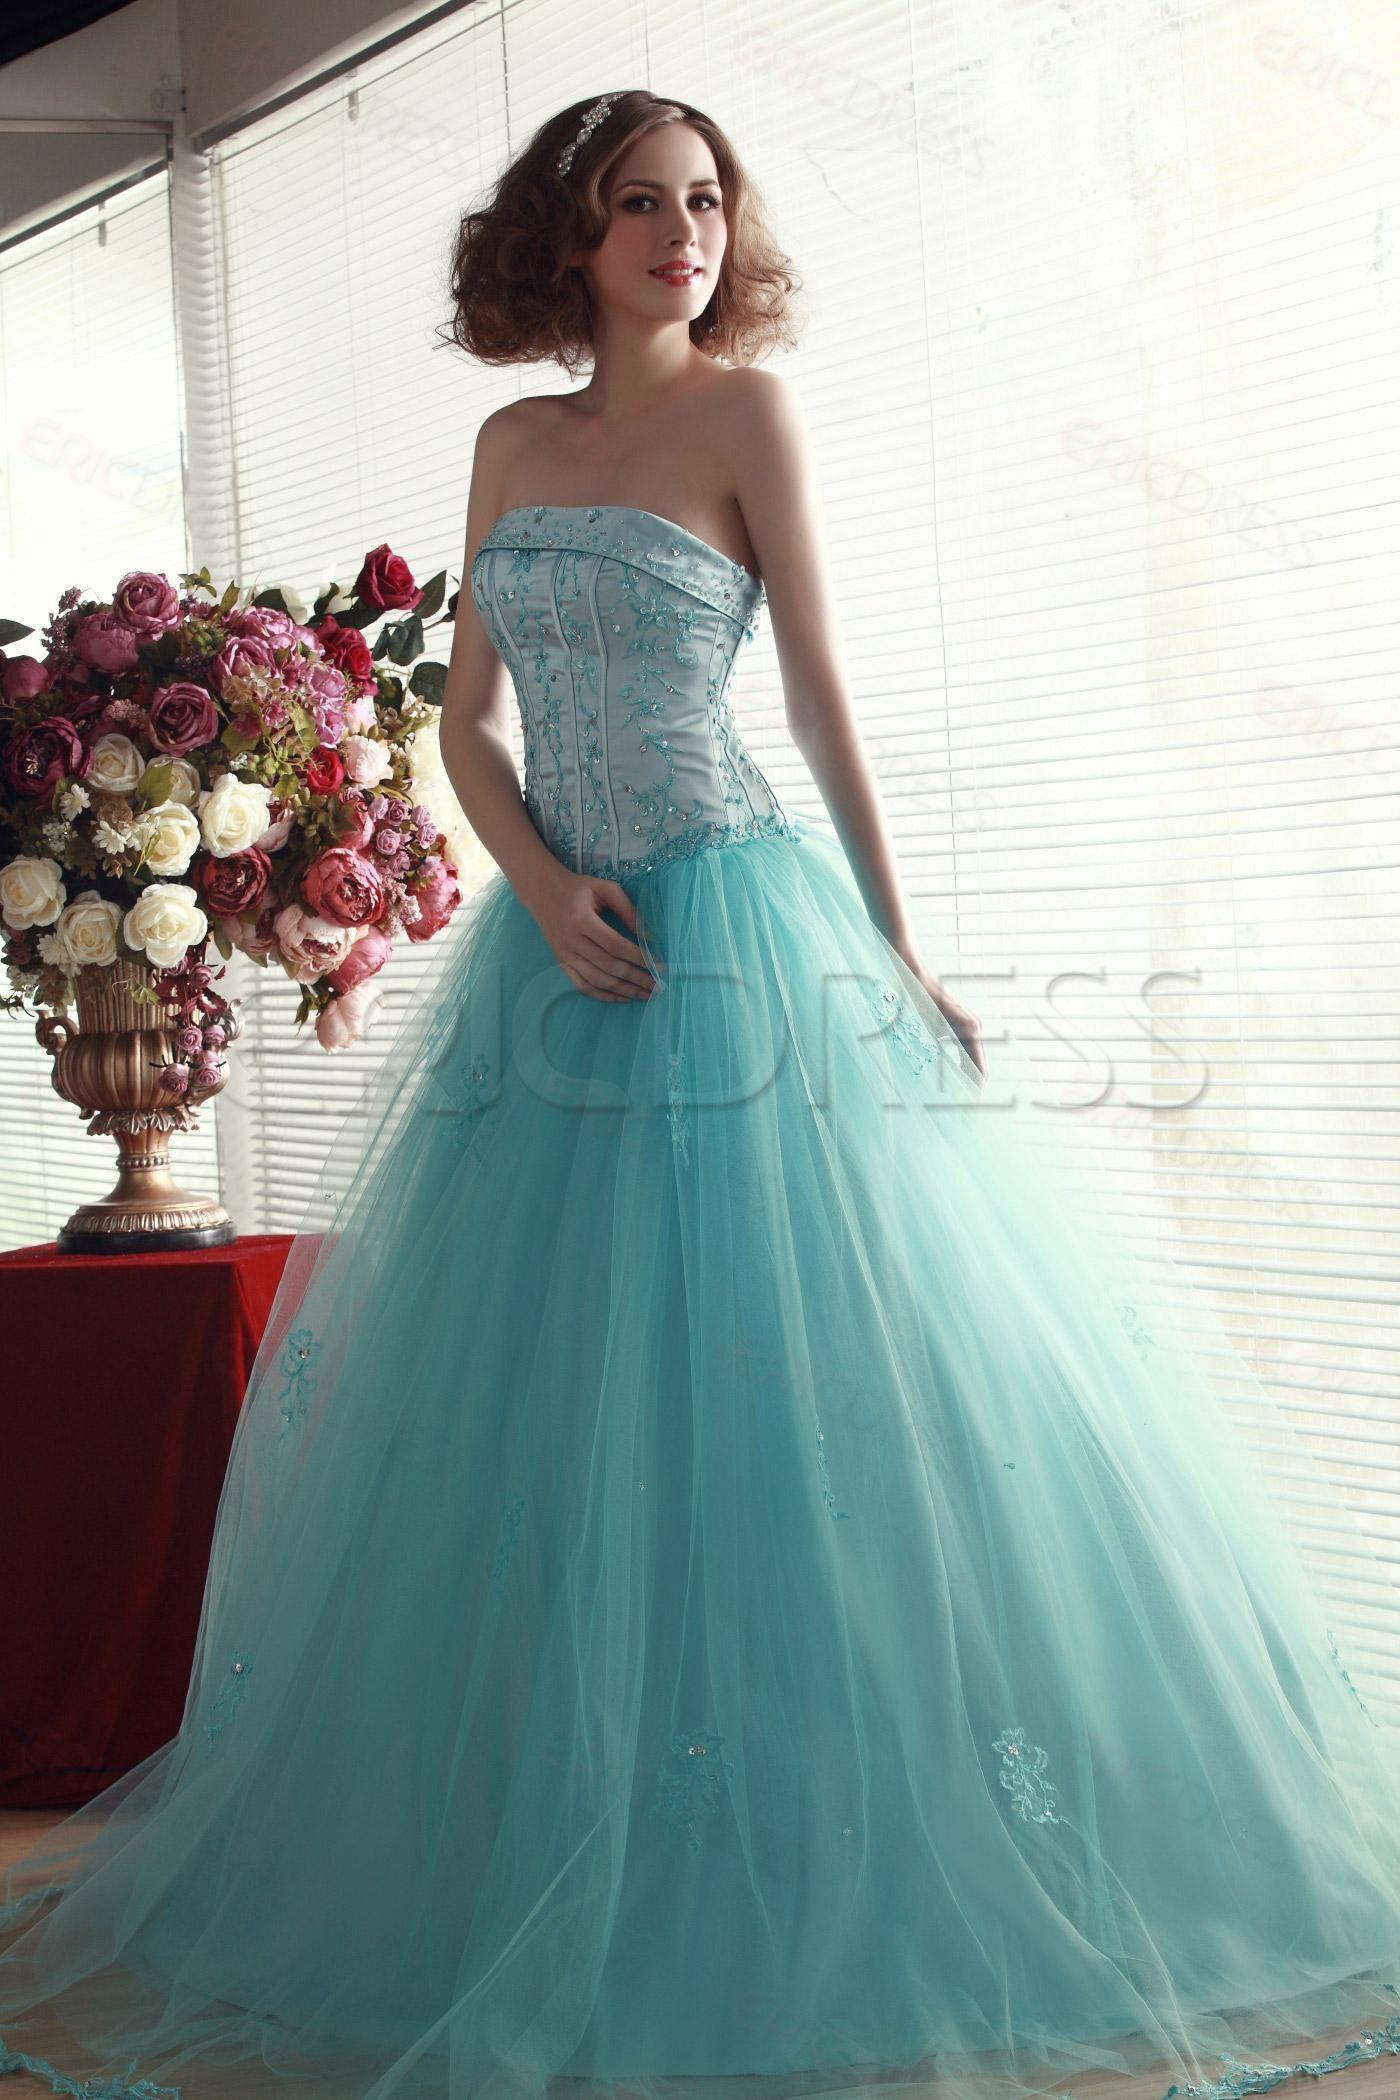 Fancy Ball Gown Floor-length Strapless Nadya\'s Quinceanera Dress 3 ...